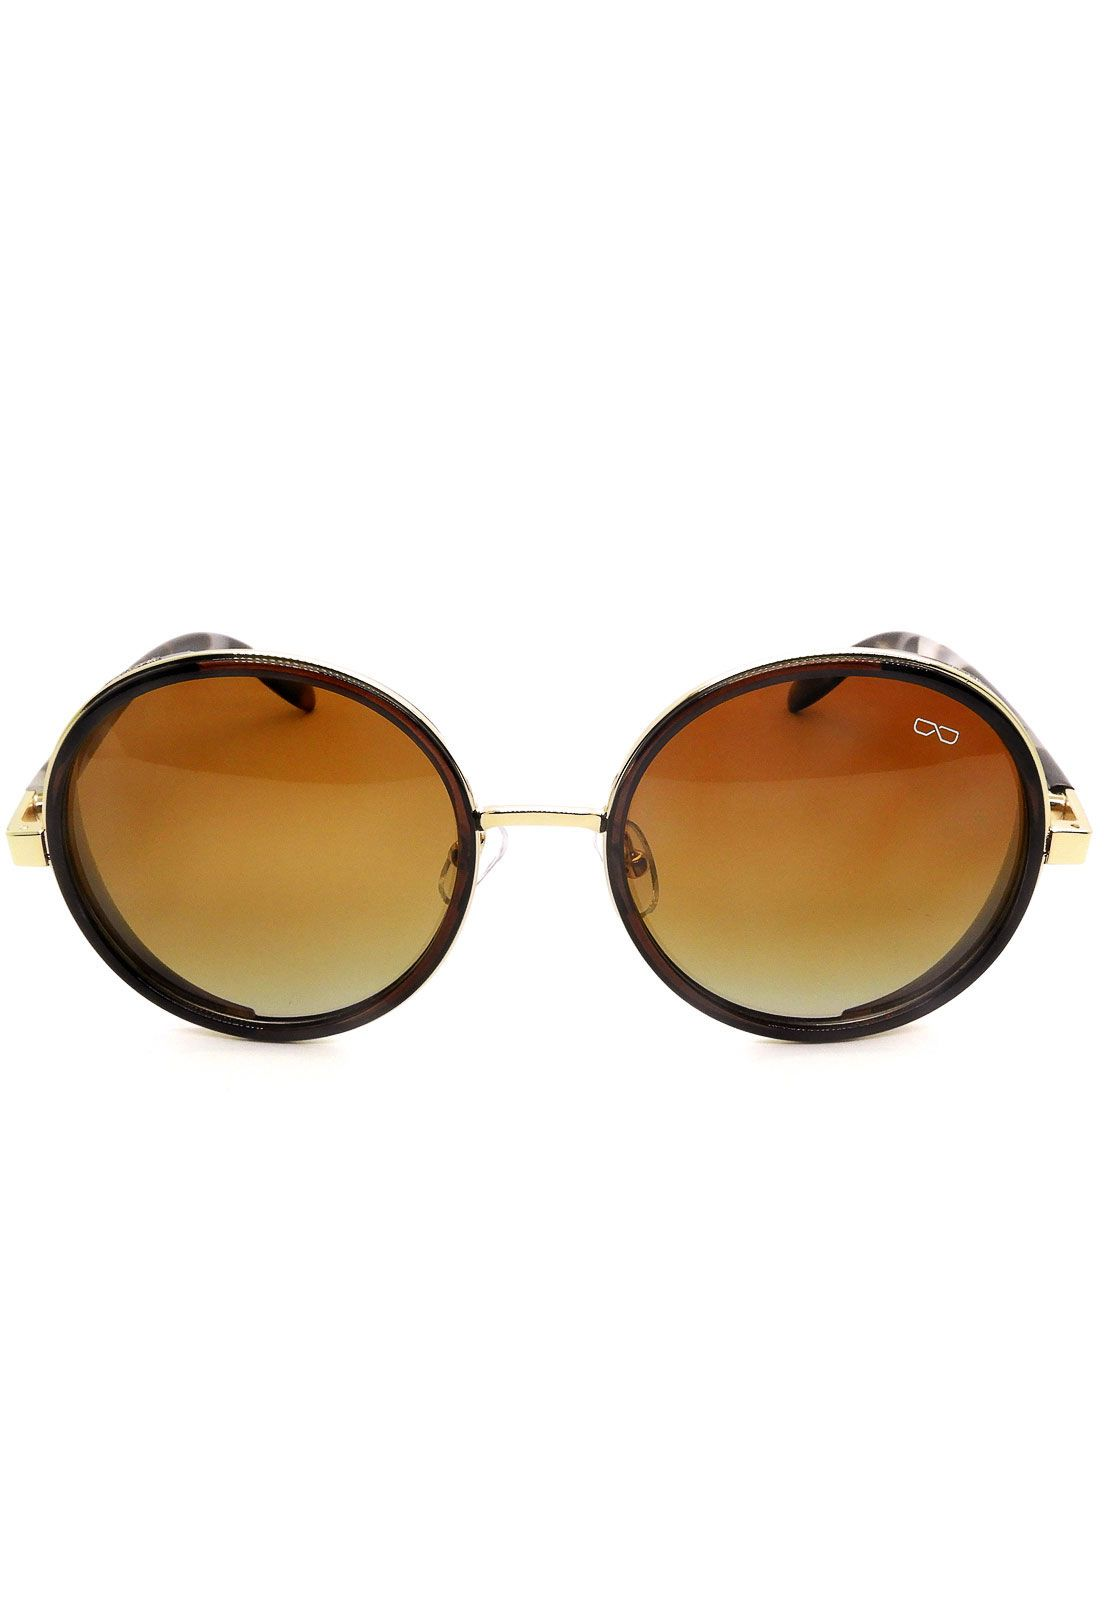 Óculos de Sol MP8048 marrom